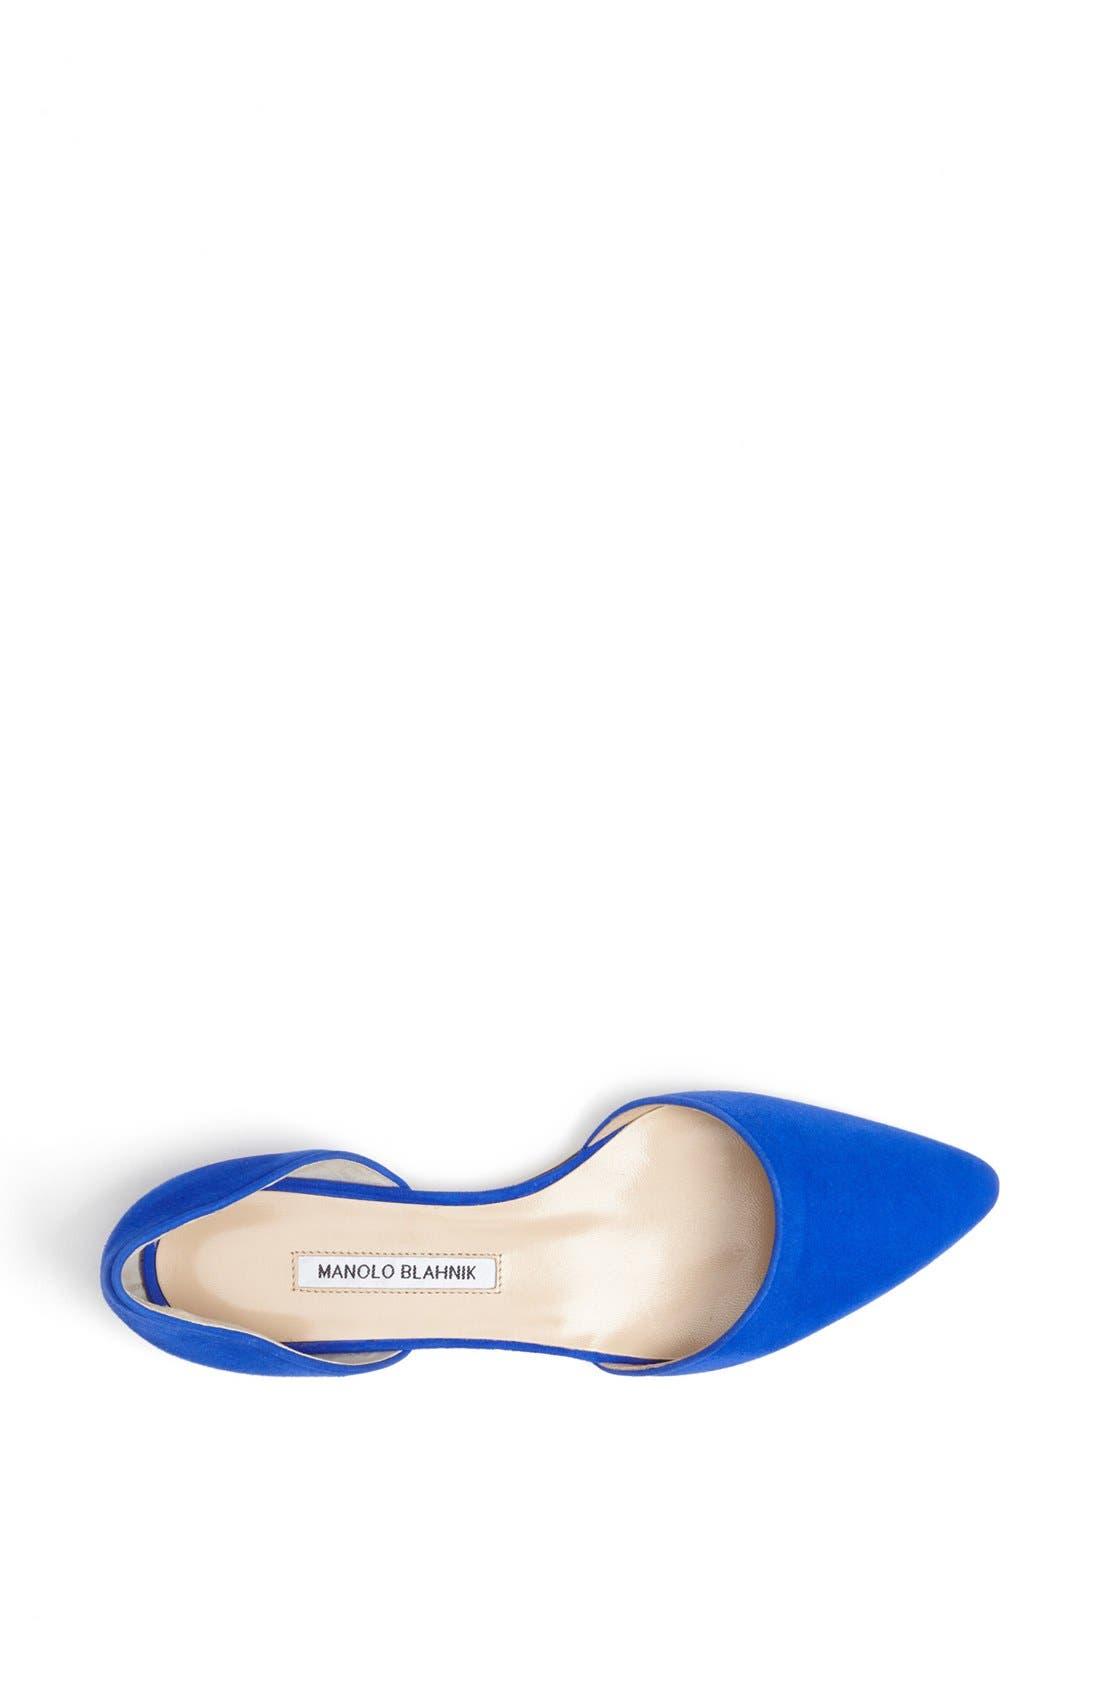 Alternate Image 3  - Manolo Blahnik 'Soussaba' Suede Pointed Toe Flat